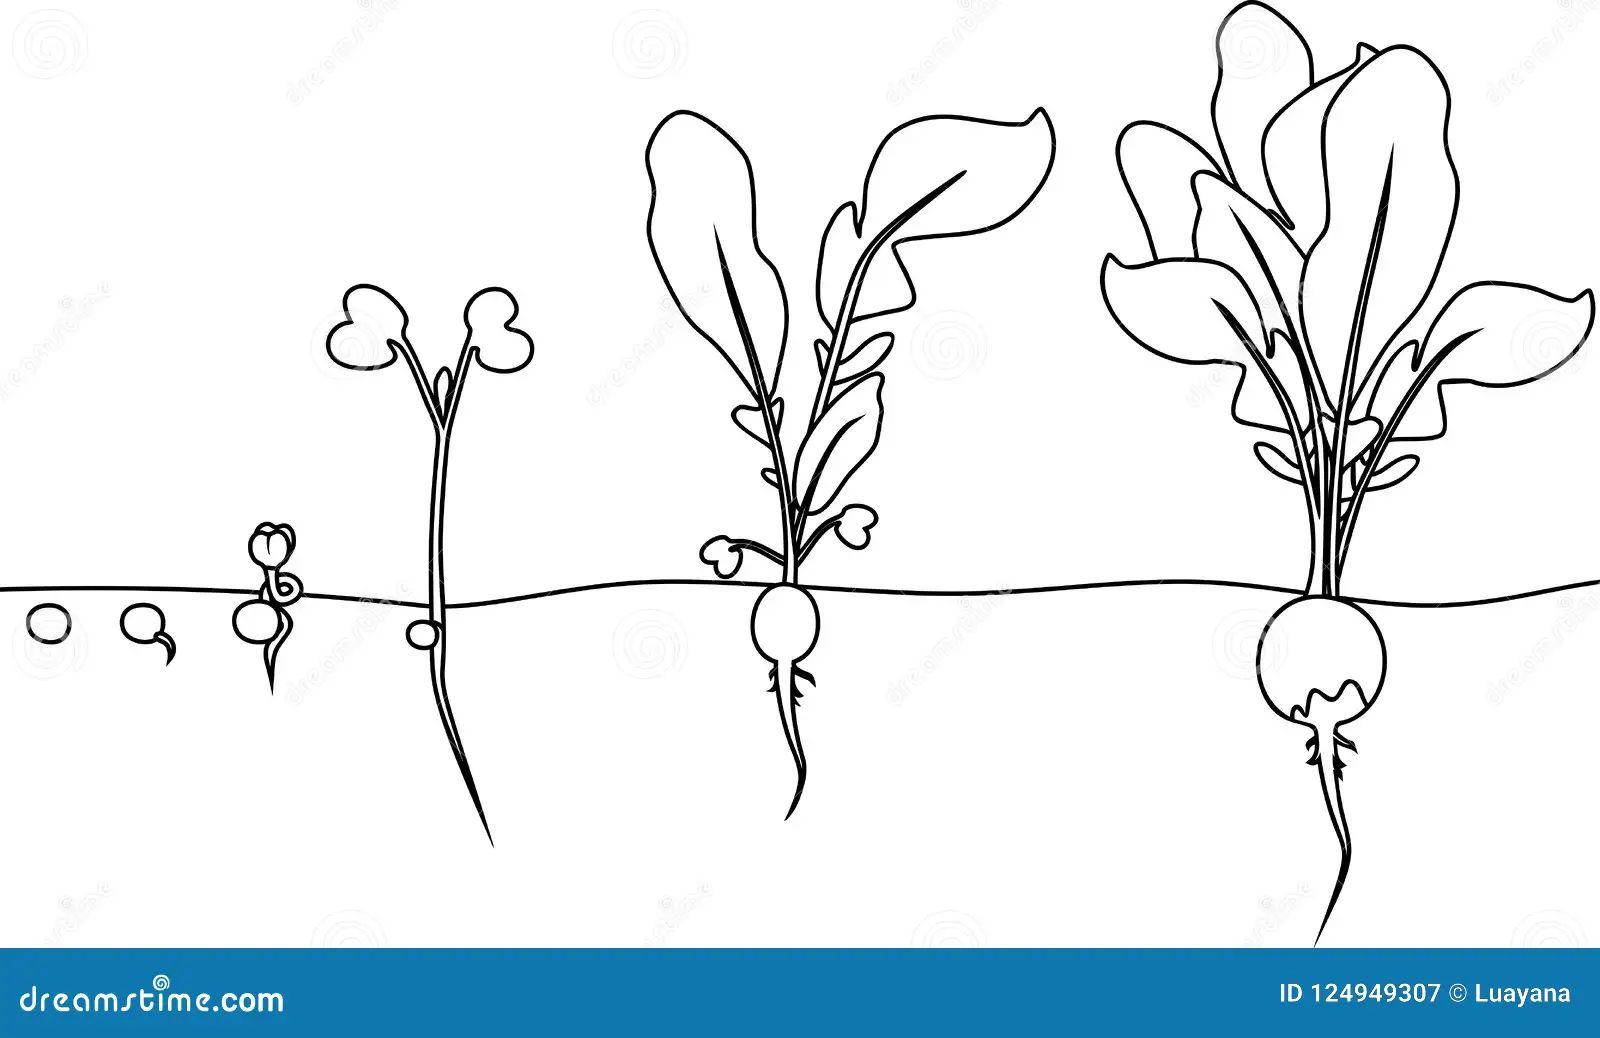 radish life cycle diagram